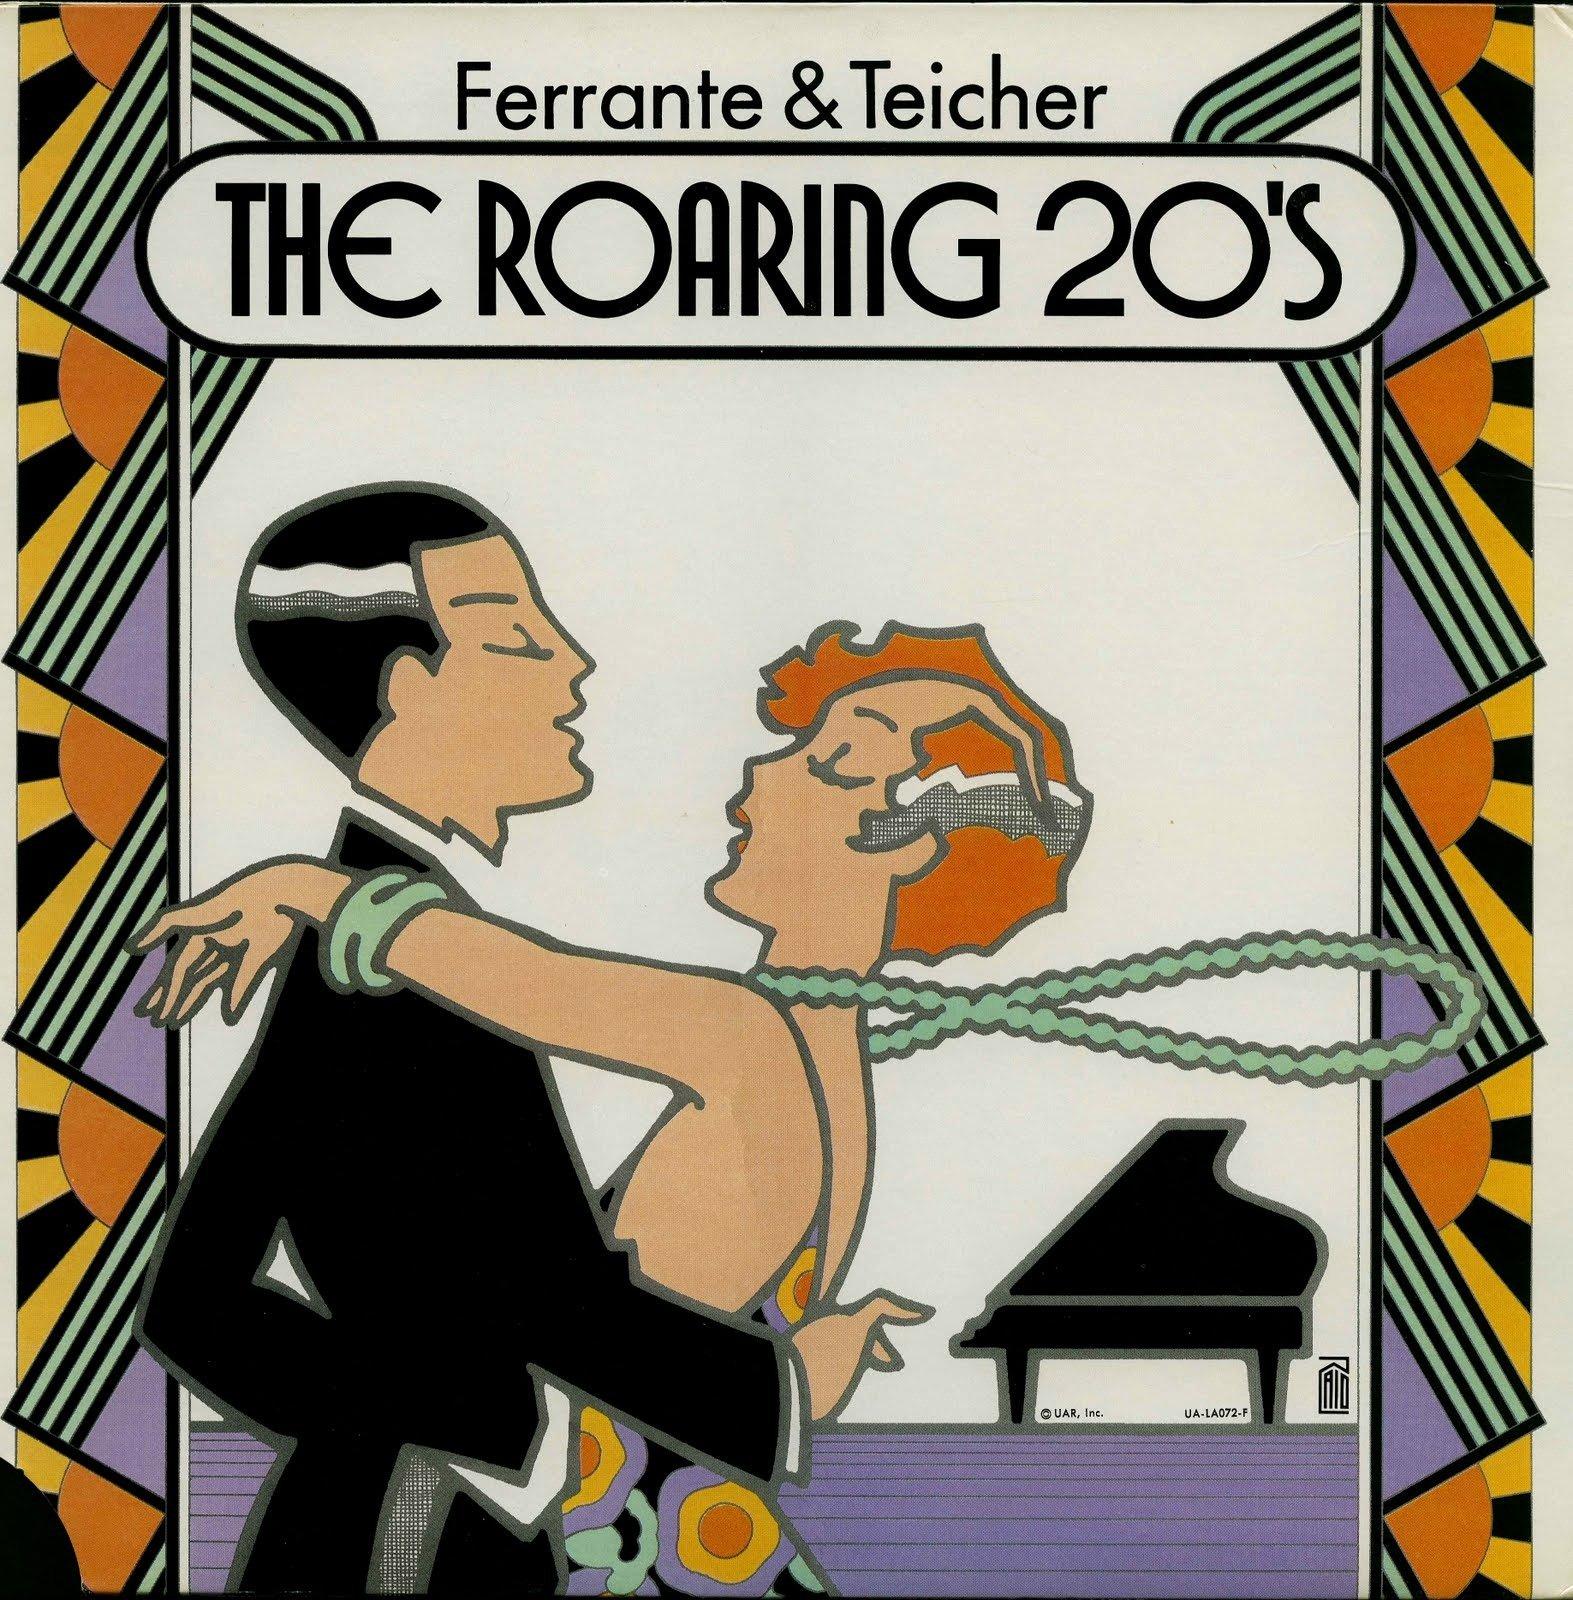 Ferrante & Teicher: The Roaring 20's (Gatefold Cover) [Vinyl LP] [Stereo] [Cutout]